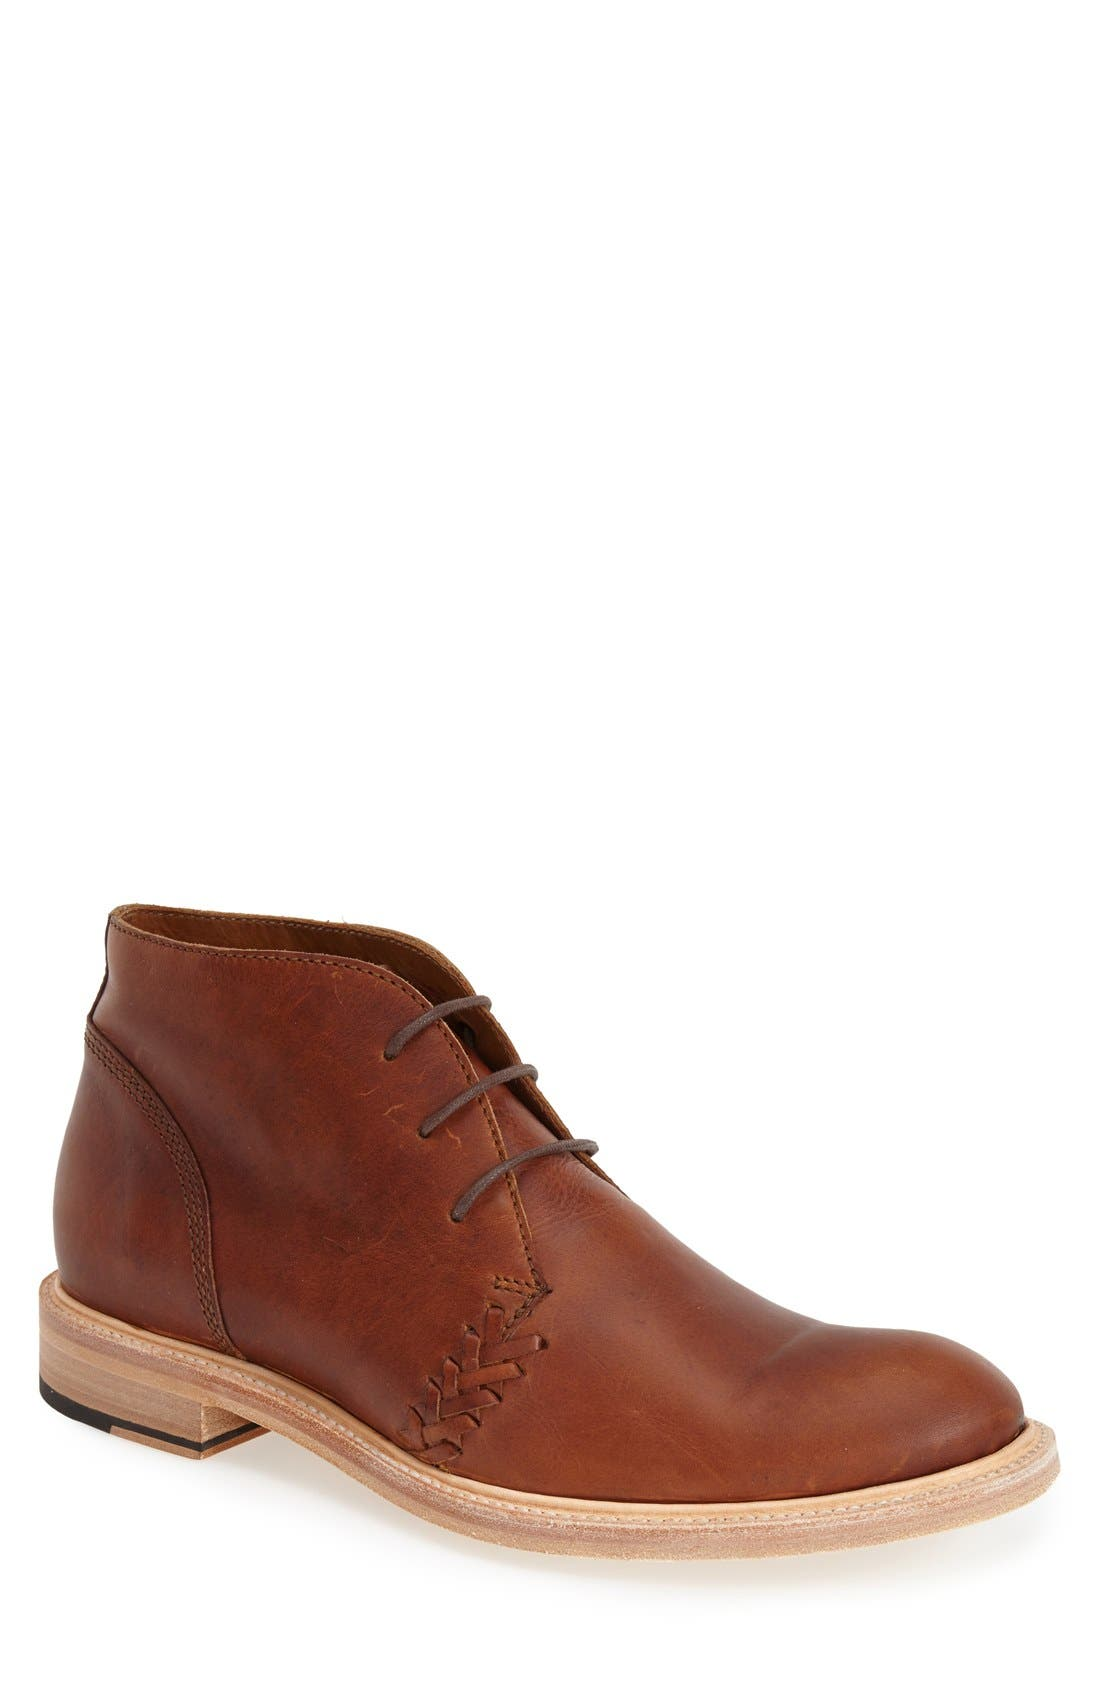 Boots 'Noris' Chukka Boot,                         Main,                         color, Evolution Tan